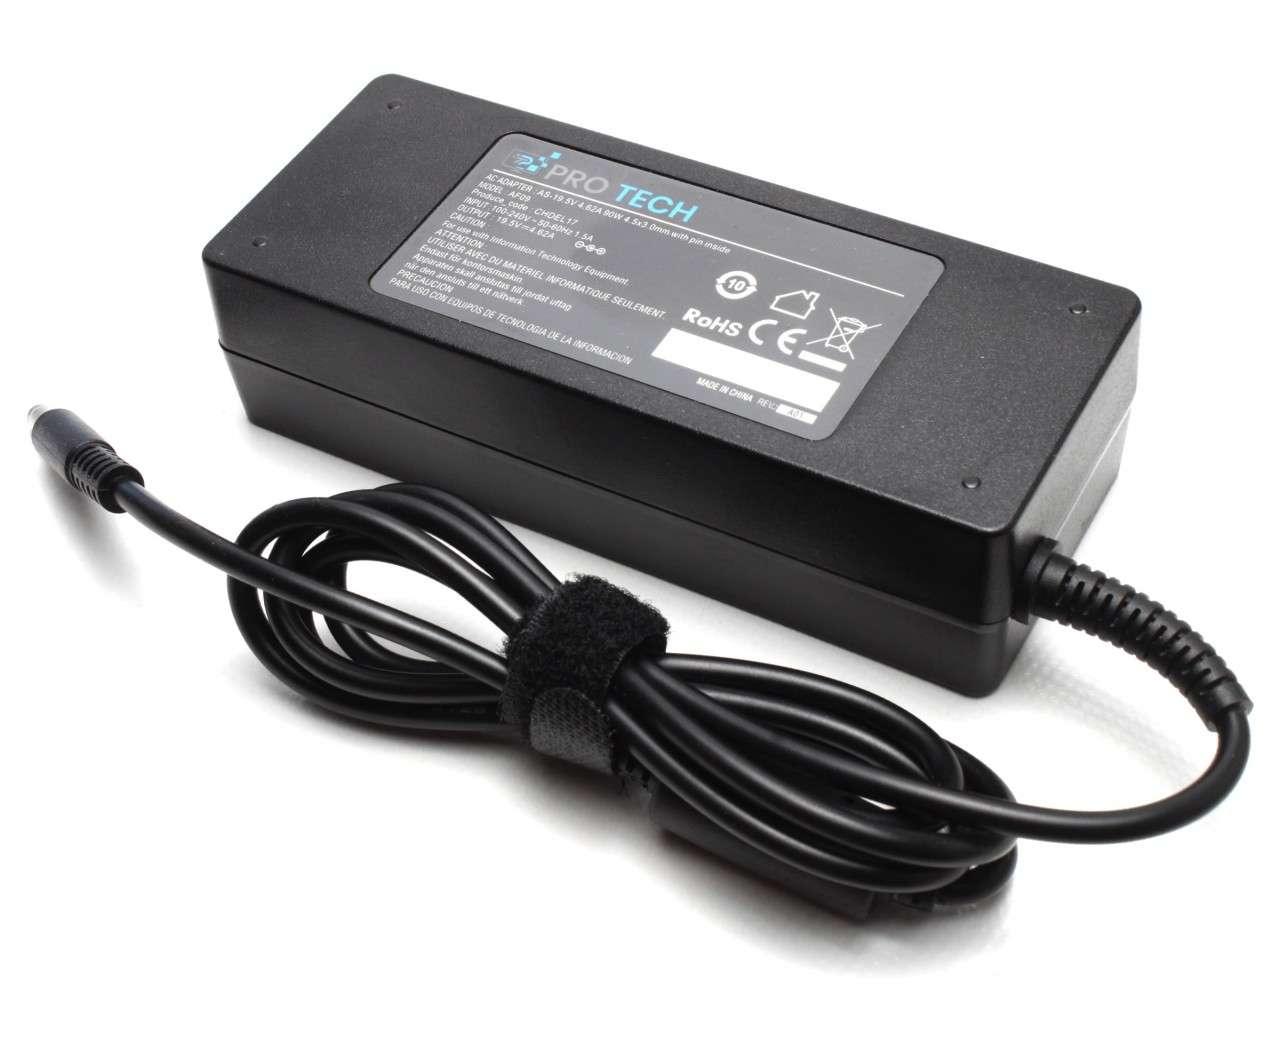 Incarcator Dell Inspiron 15 7558 90W Replacement imagine powerlaptop.ro 2021